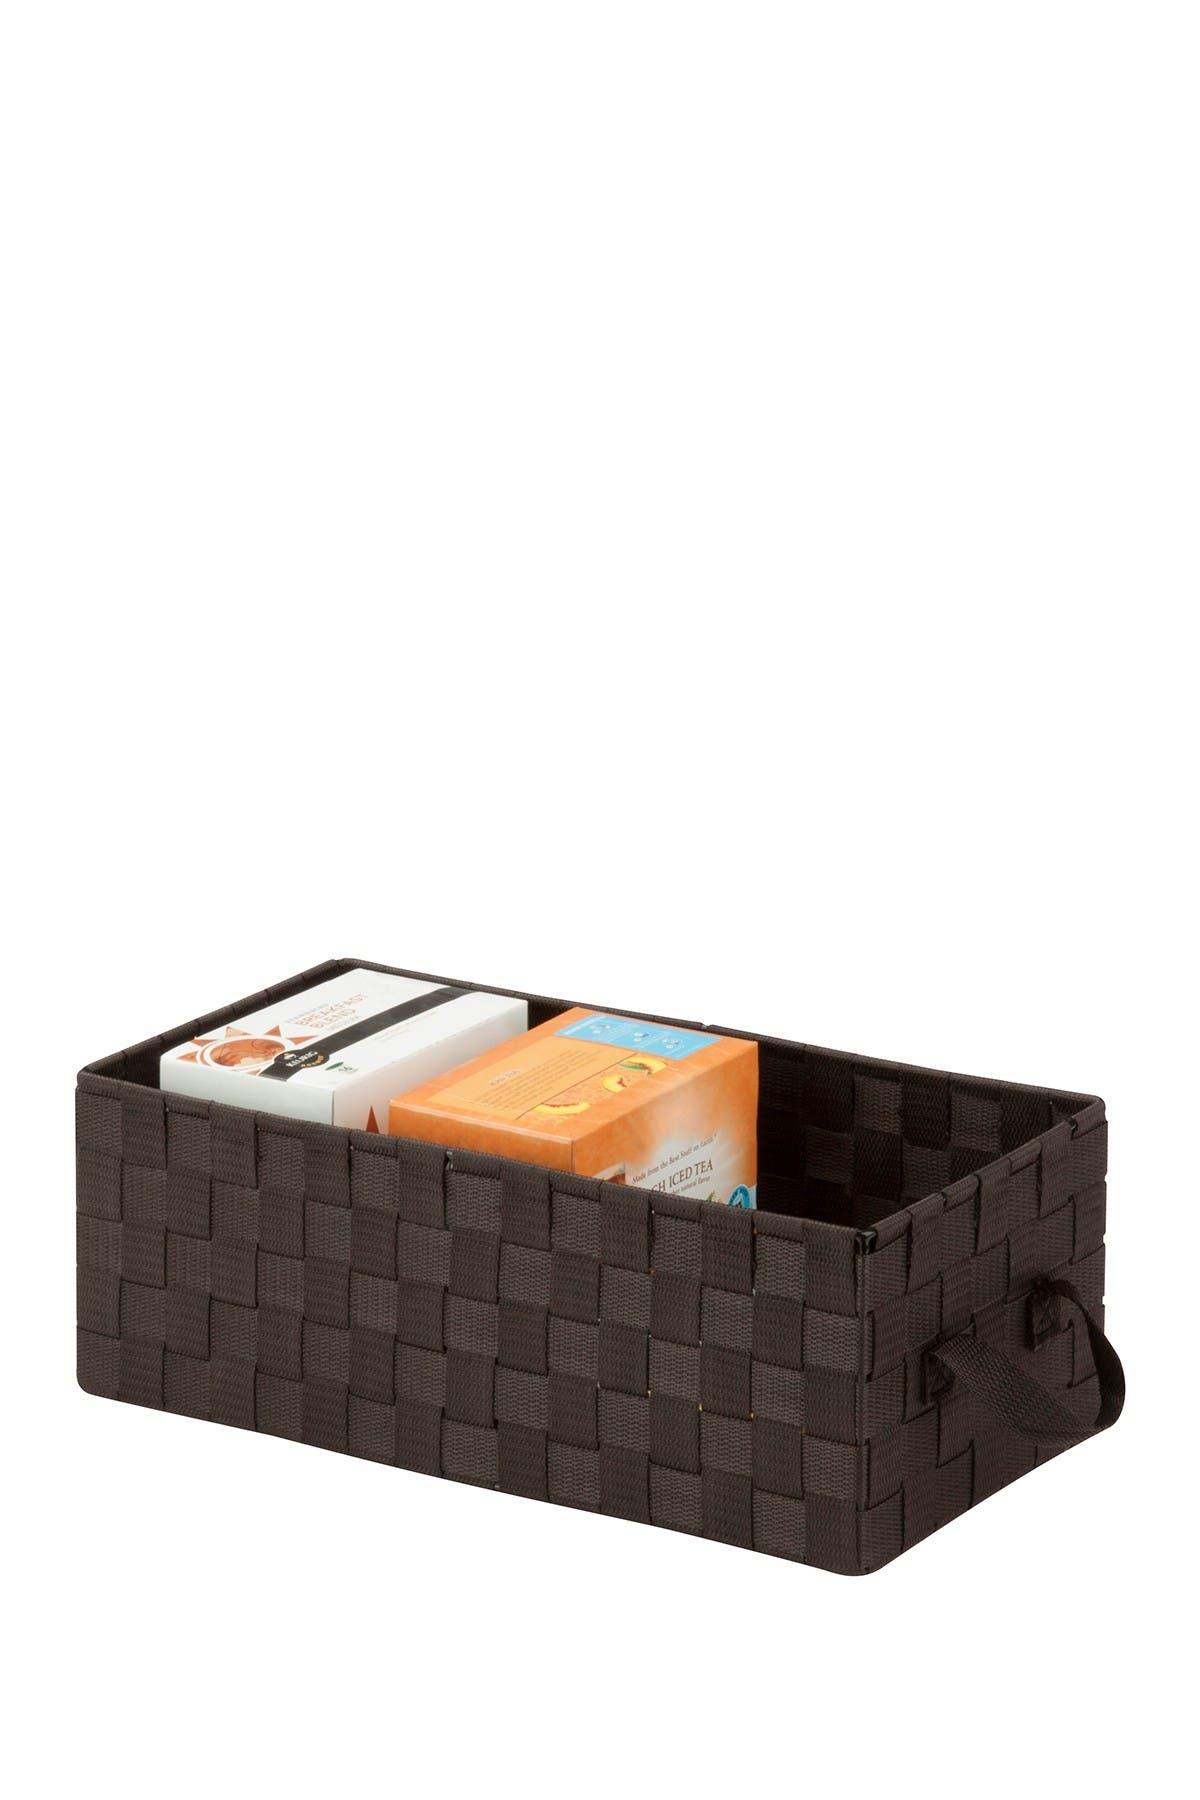 Image of Honey-Can-Do Espresso Woven All-Purpose Basket